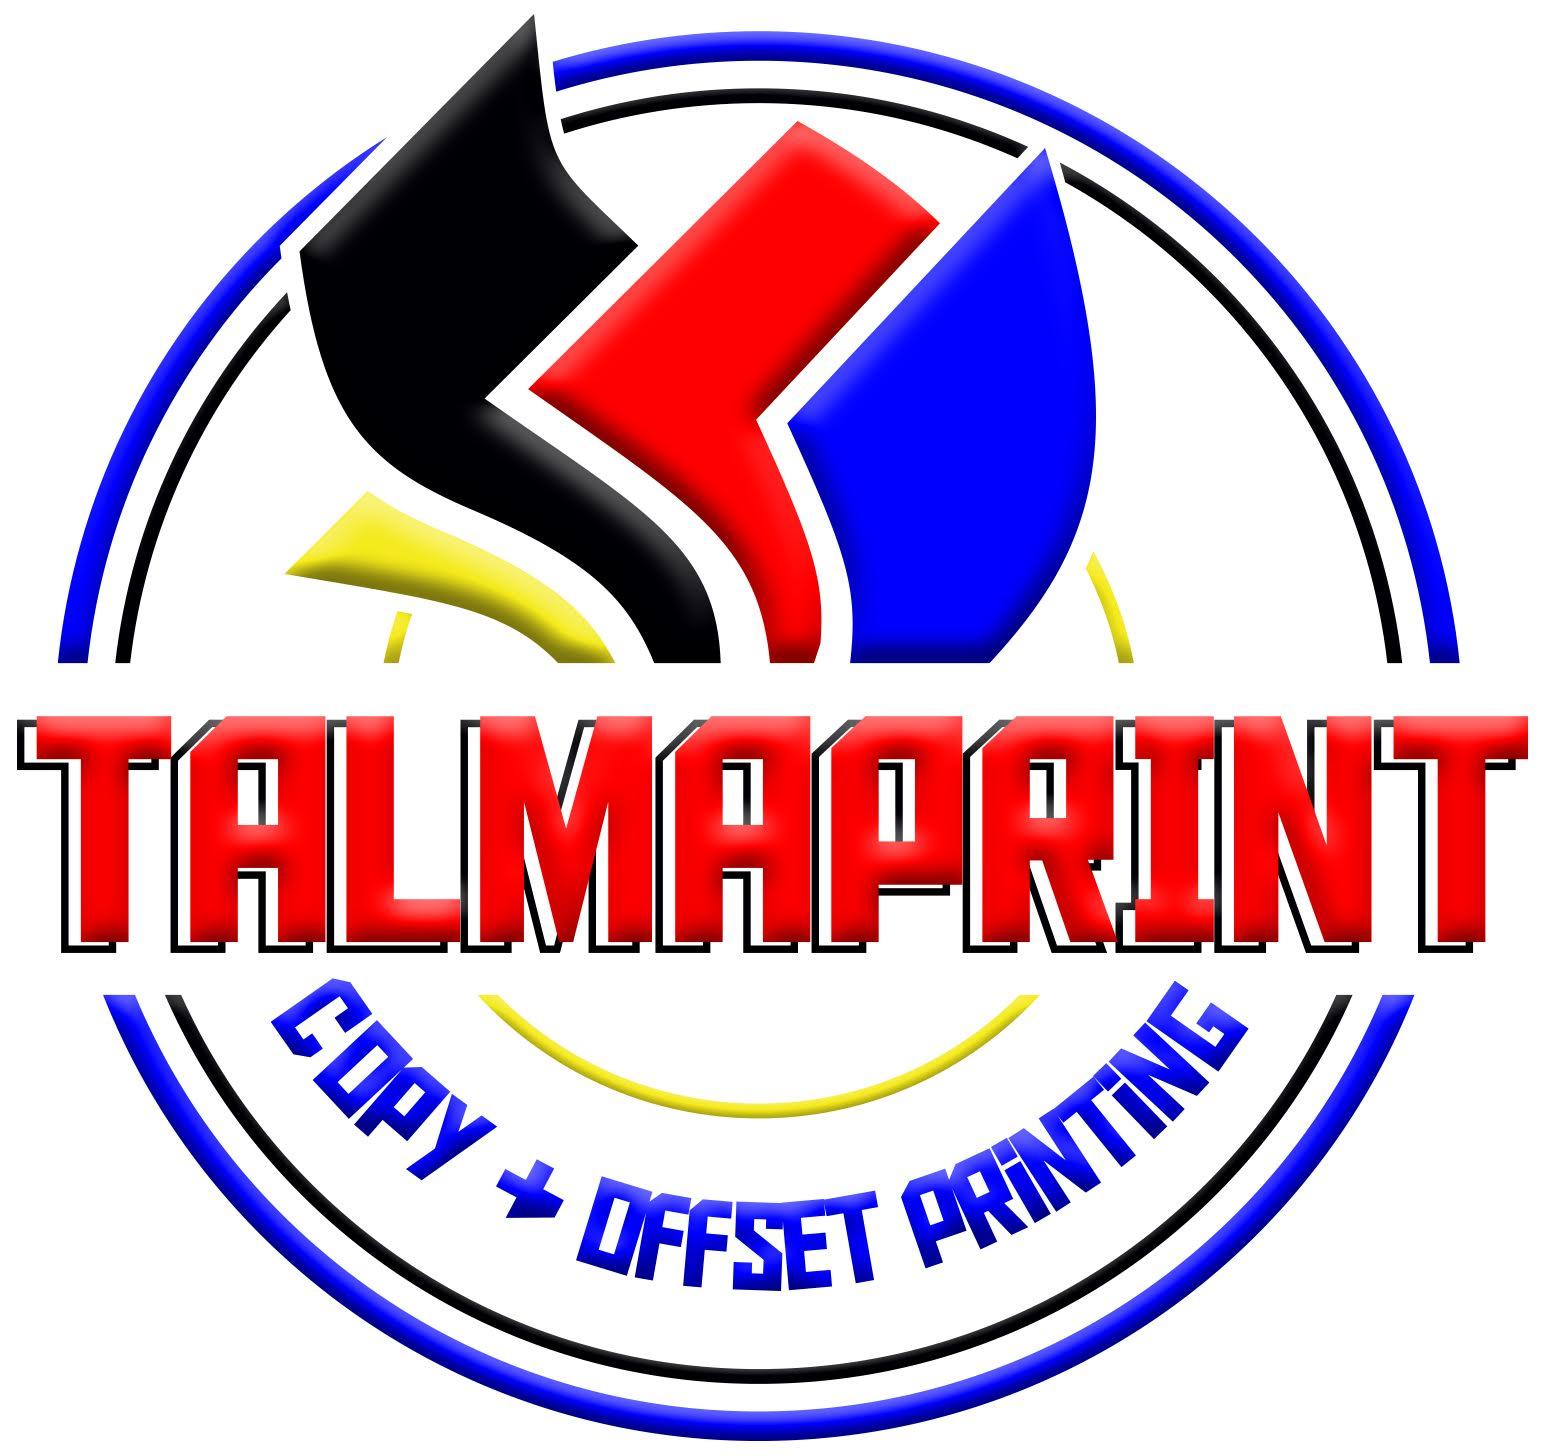 https://www.offsetprinting21.com/2019/03/jasa-print-a0-a1-a2-di-jakarta.html